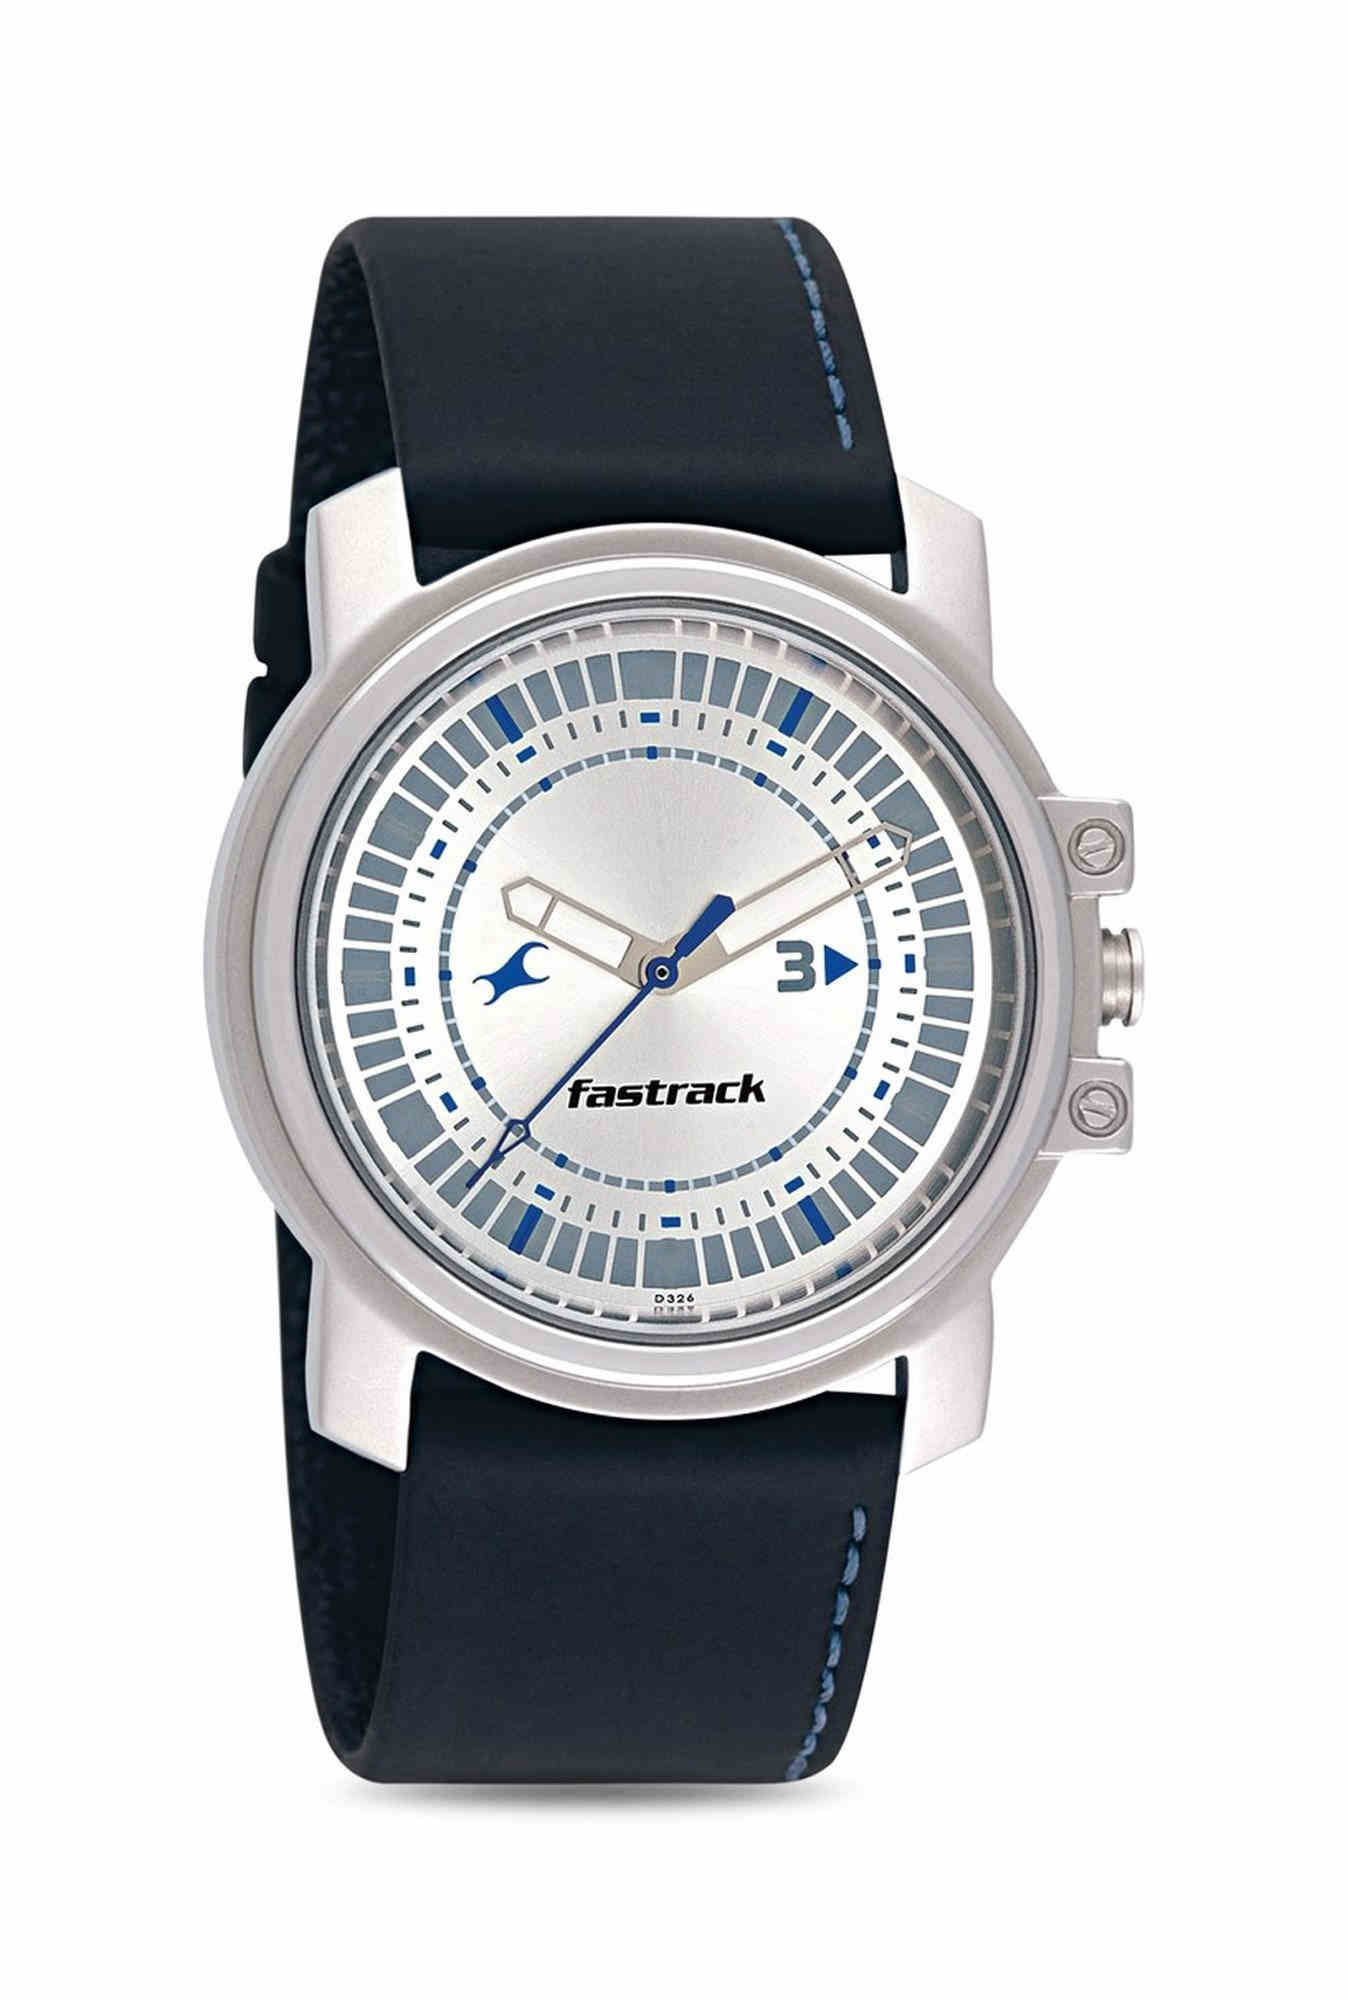 9fc7ad8d5 39% OFF Fastrack NE3039SL01 Economy Analog Silver Dial Men s Watch  (NE3039SL01)